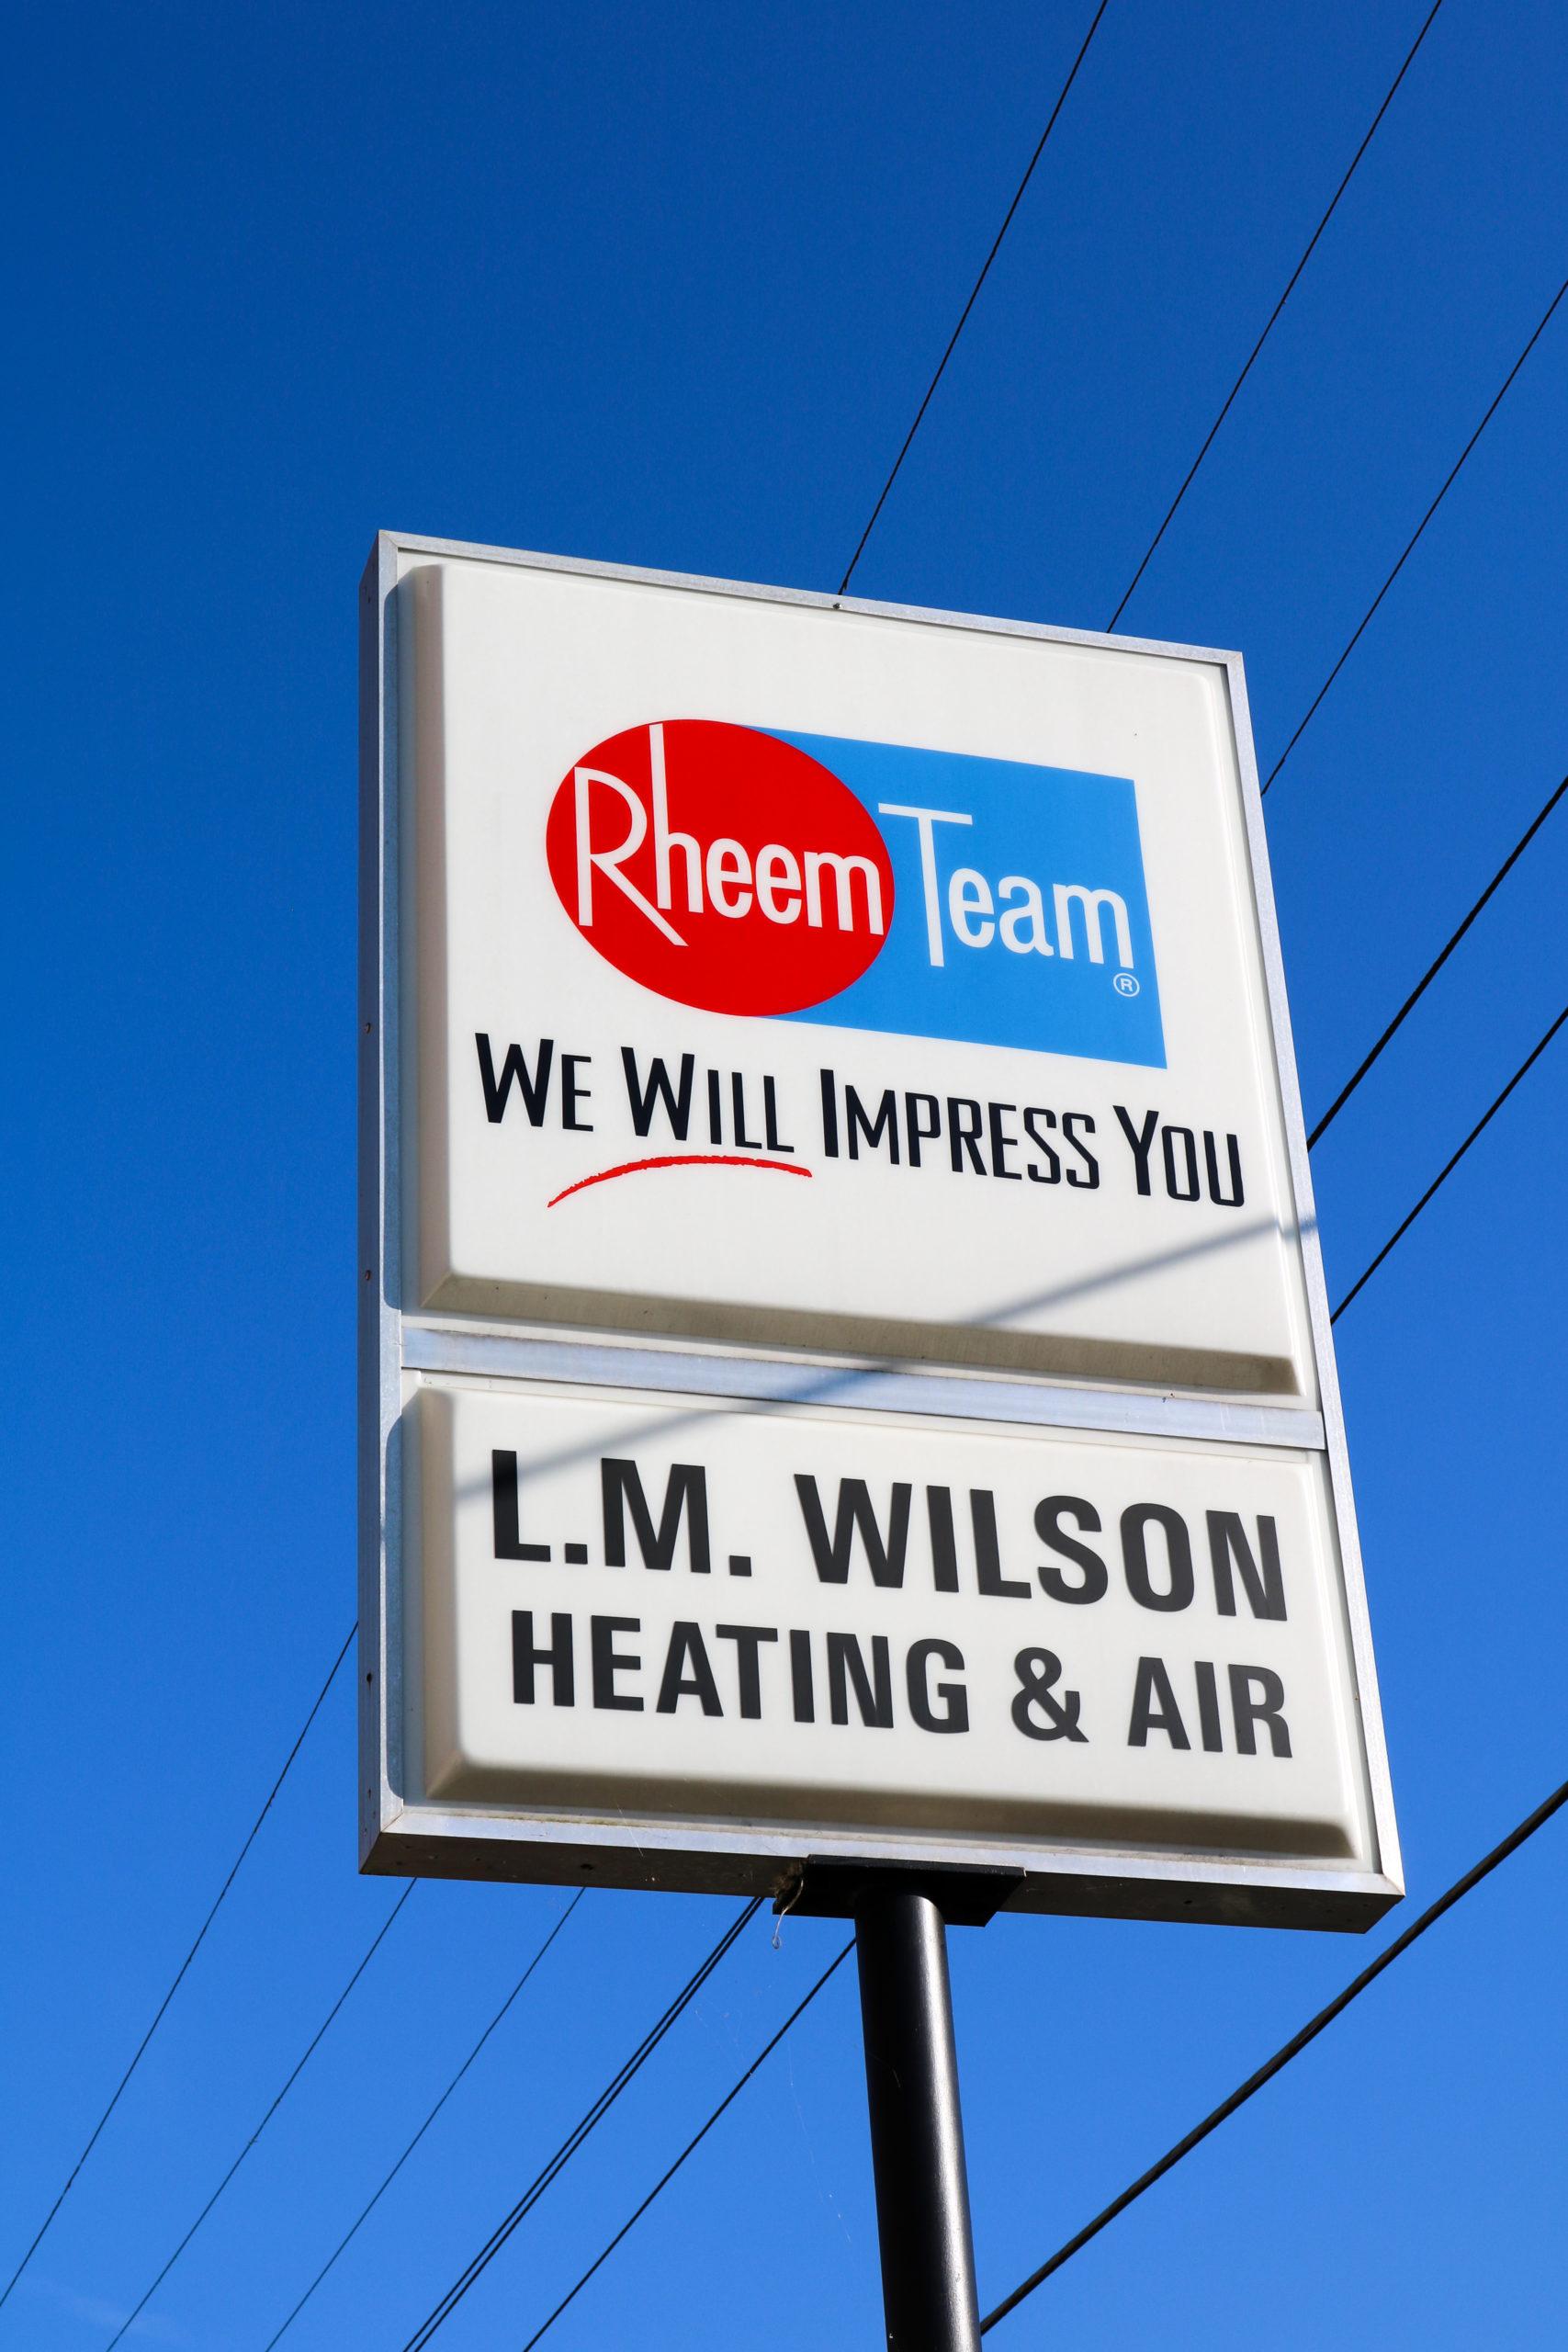 https://lmwilson.com/wp-content/uploads/2020/02/LM-Wilson-Sign-scaled.jpg